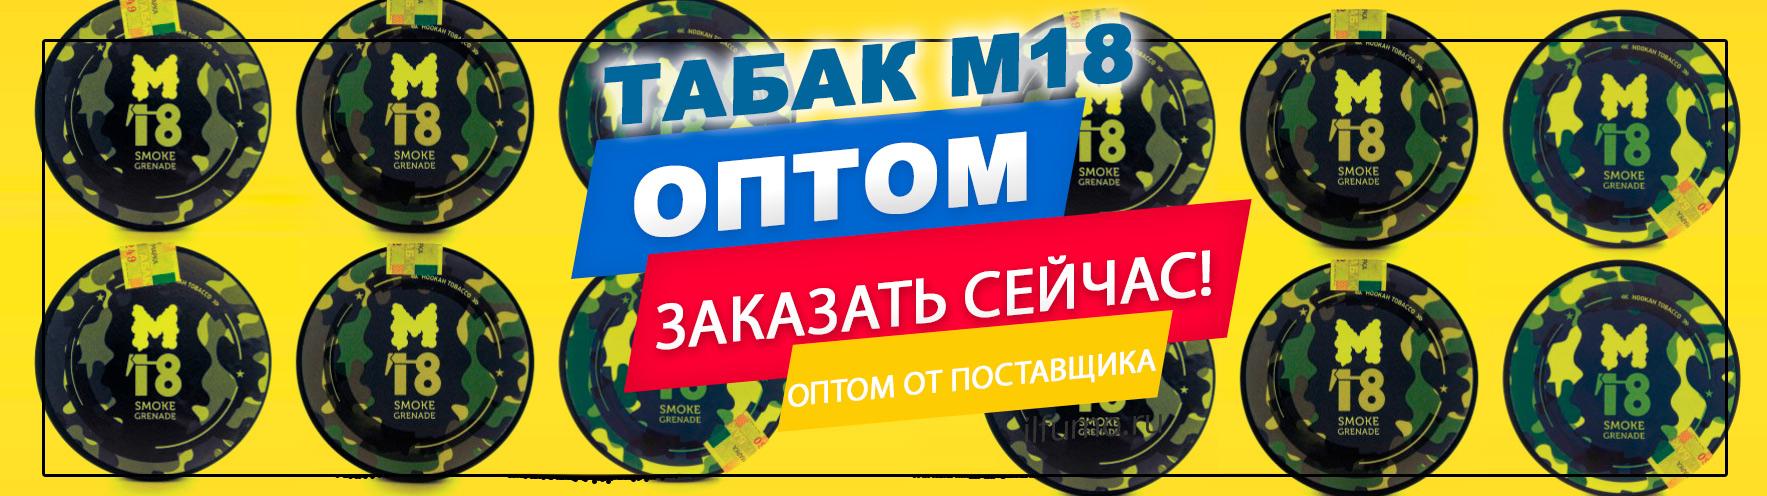 tabak dlja kaljana m18 optom - Табак для кальяна М18